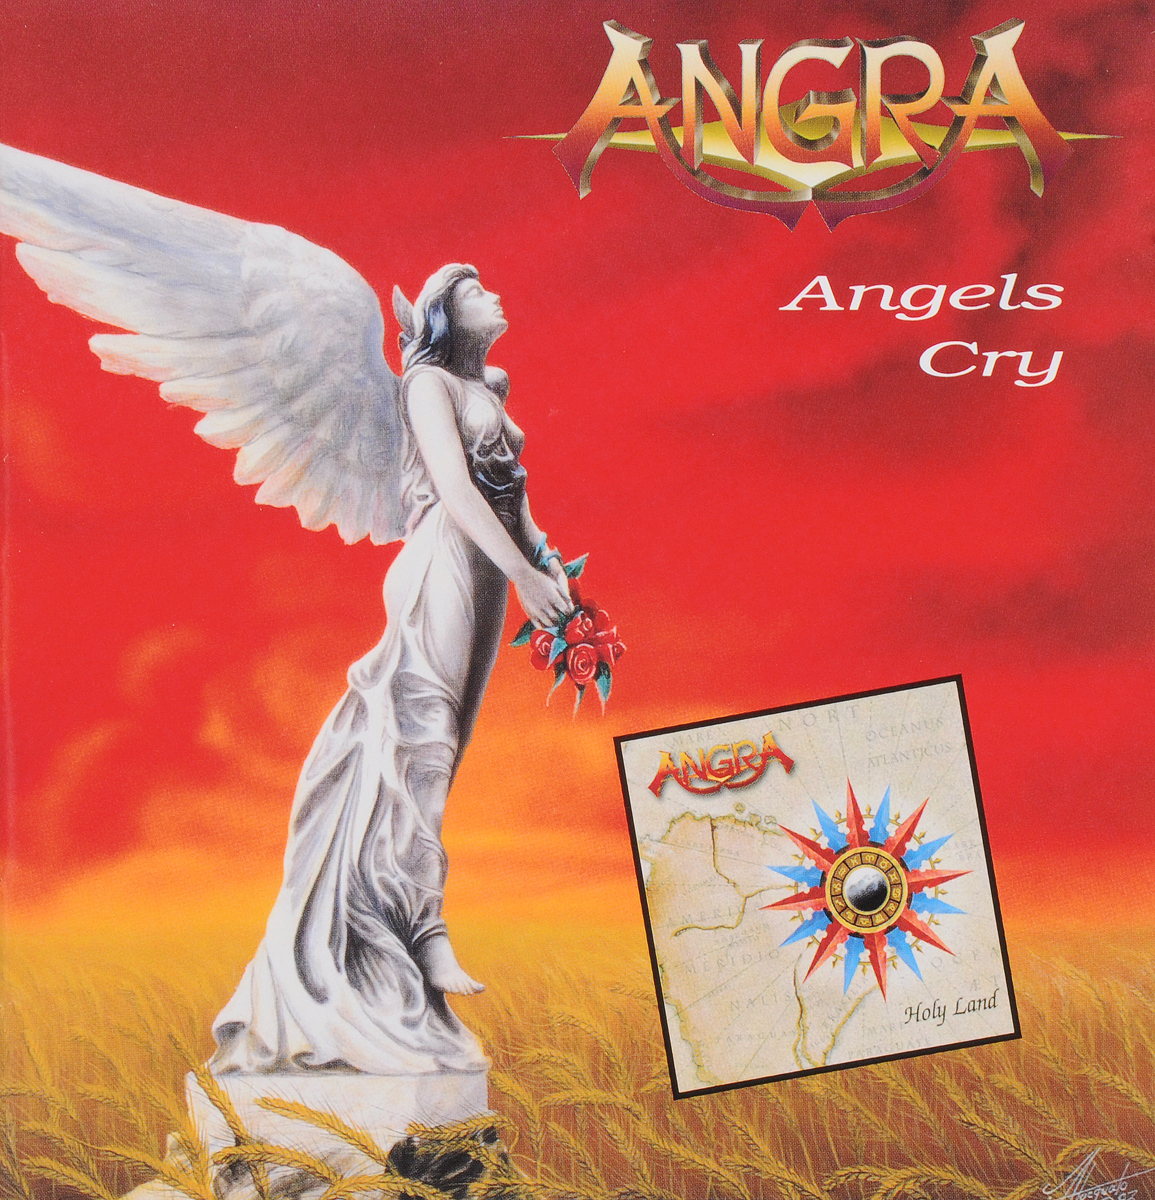 Angra Angra. Angels Cry / Holy Land (2 CD) angra fortaleza